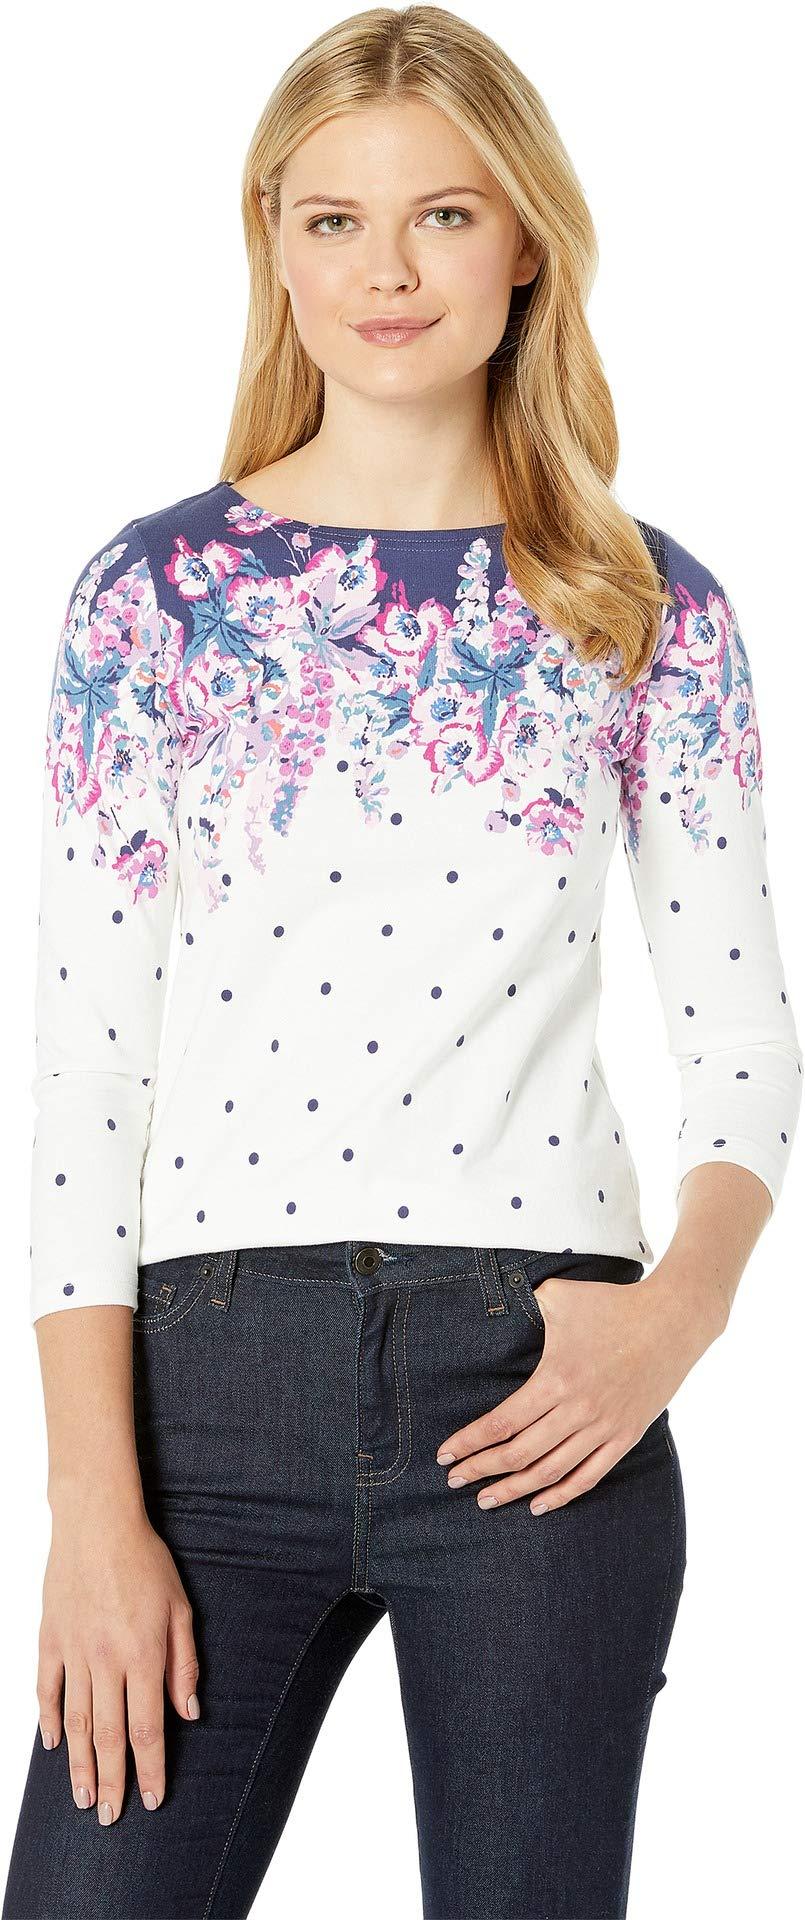 Joules Women's Harbour Print Jersey Top Cream Floral Spot 2